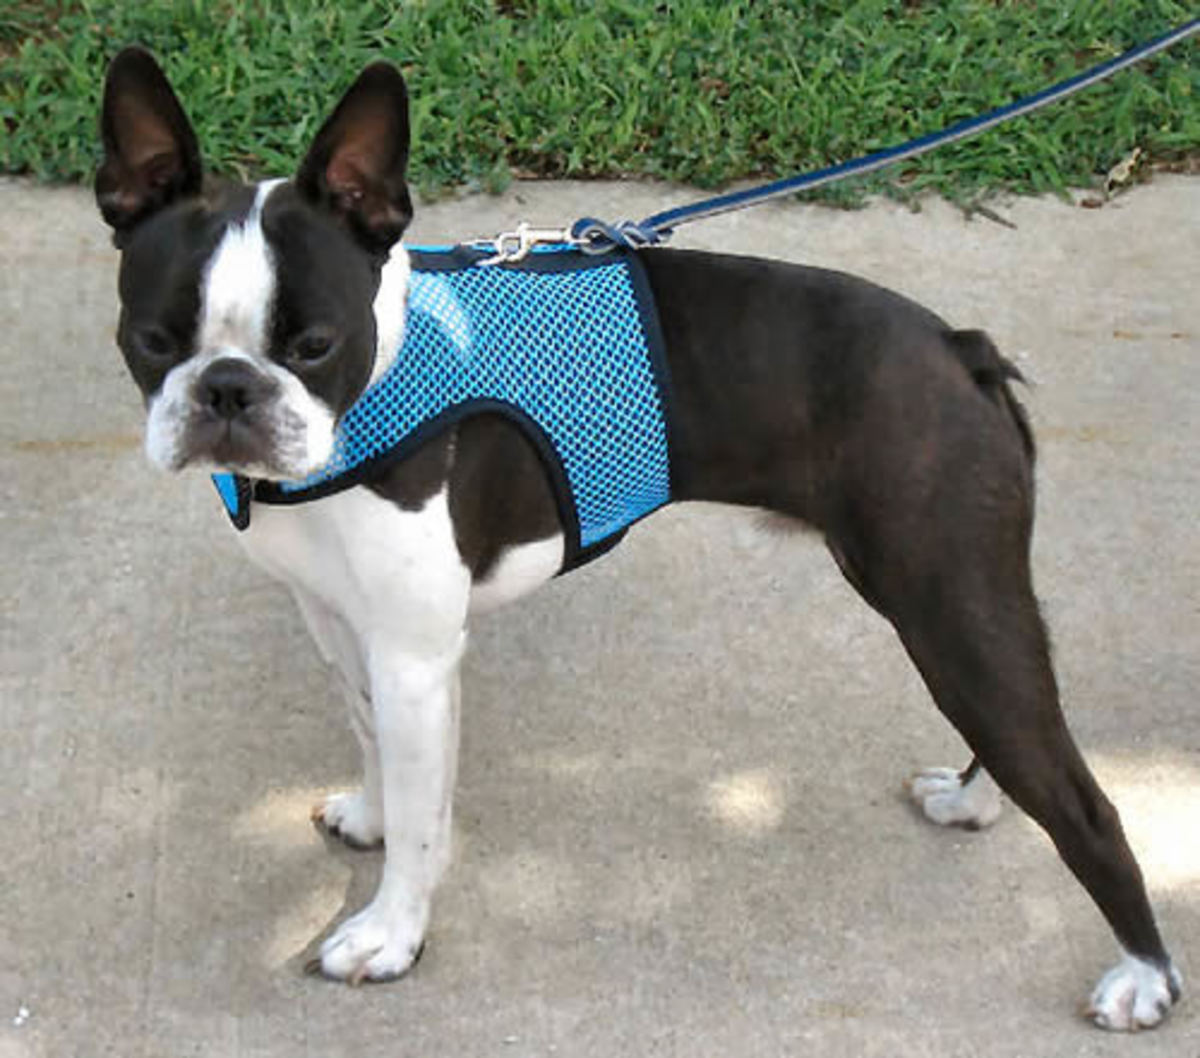 Booker (Boston Terrier) in the Wrap-n-Go Harness